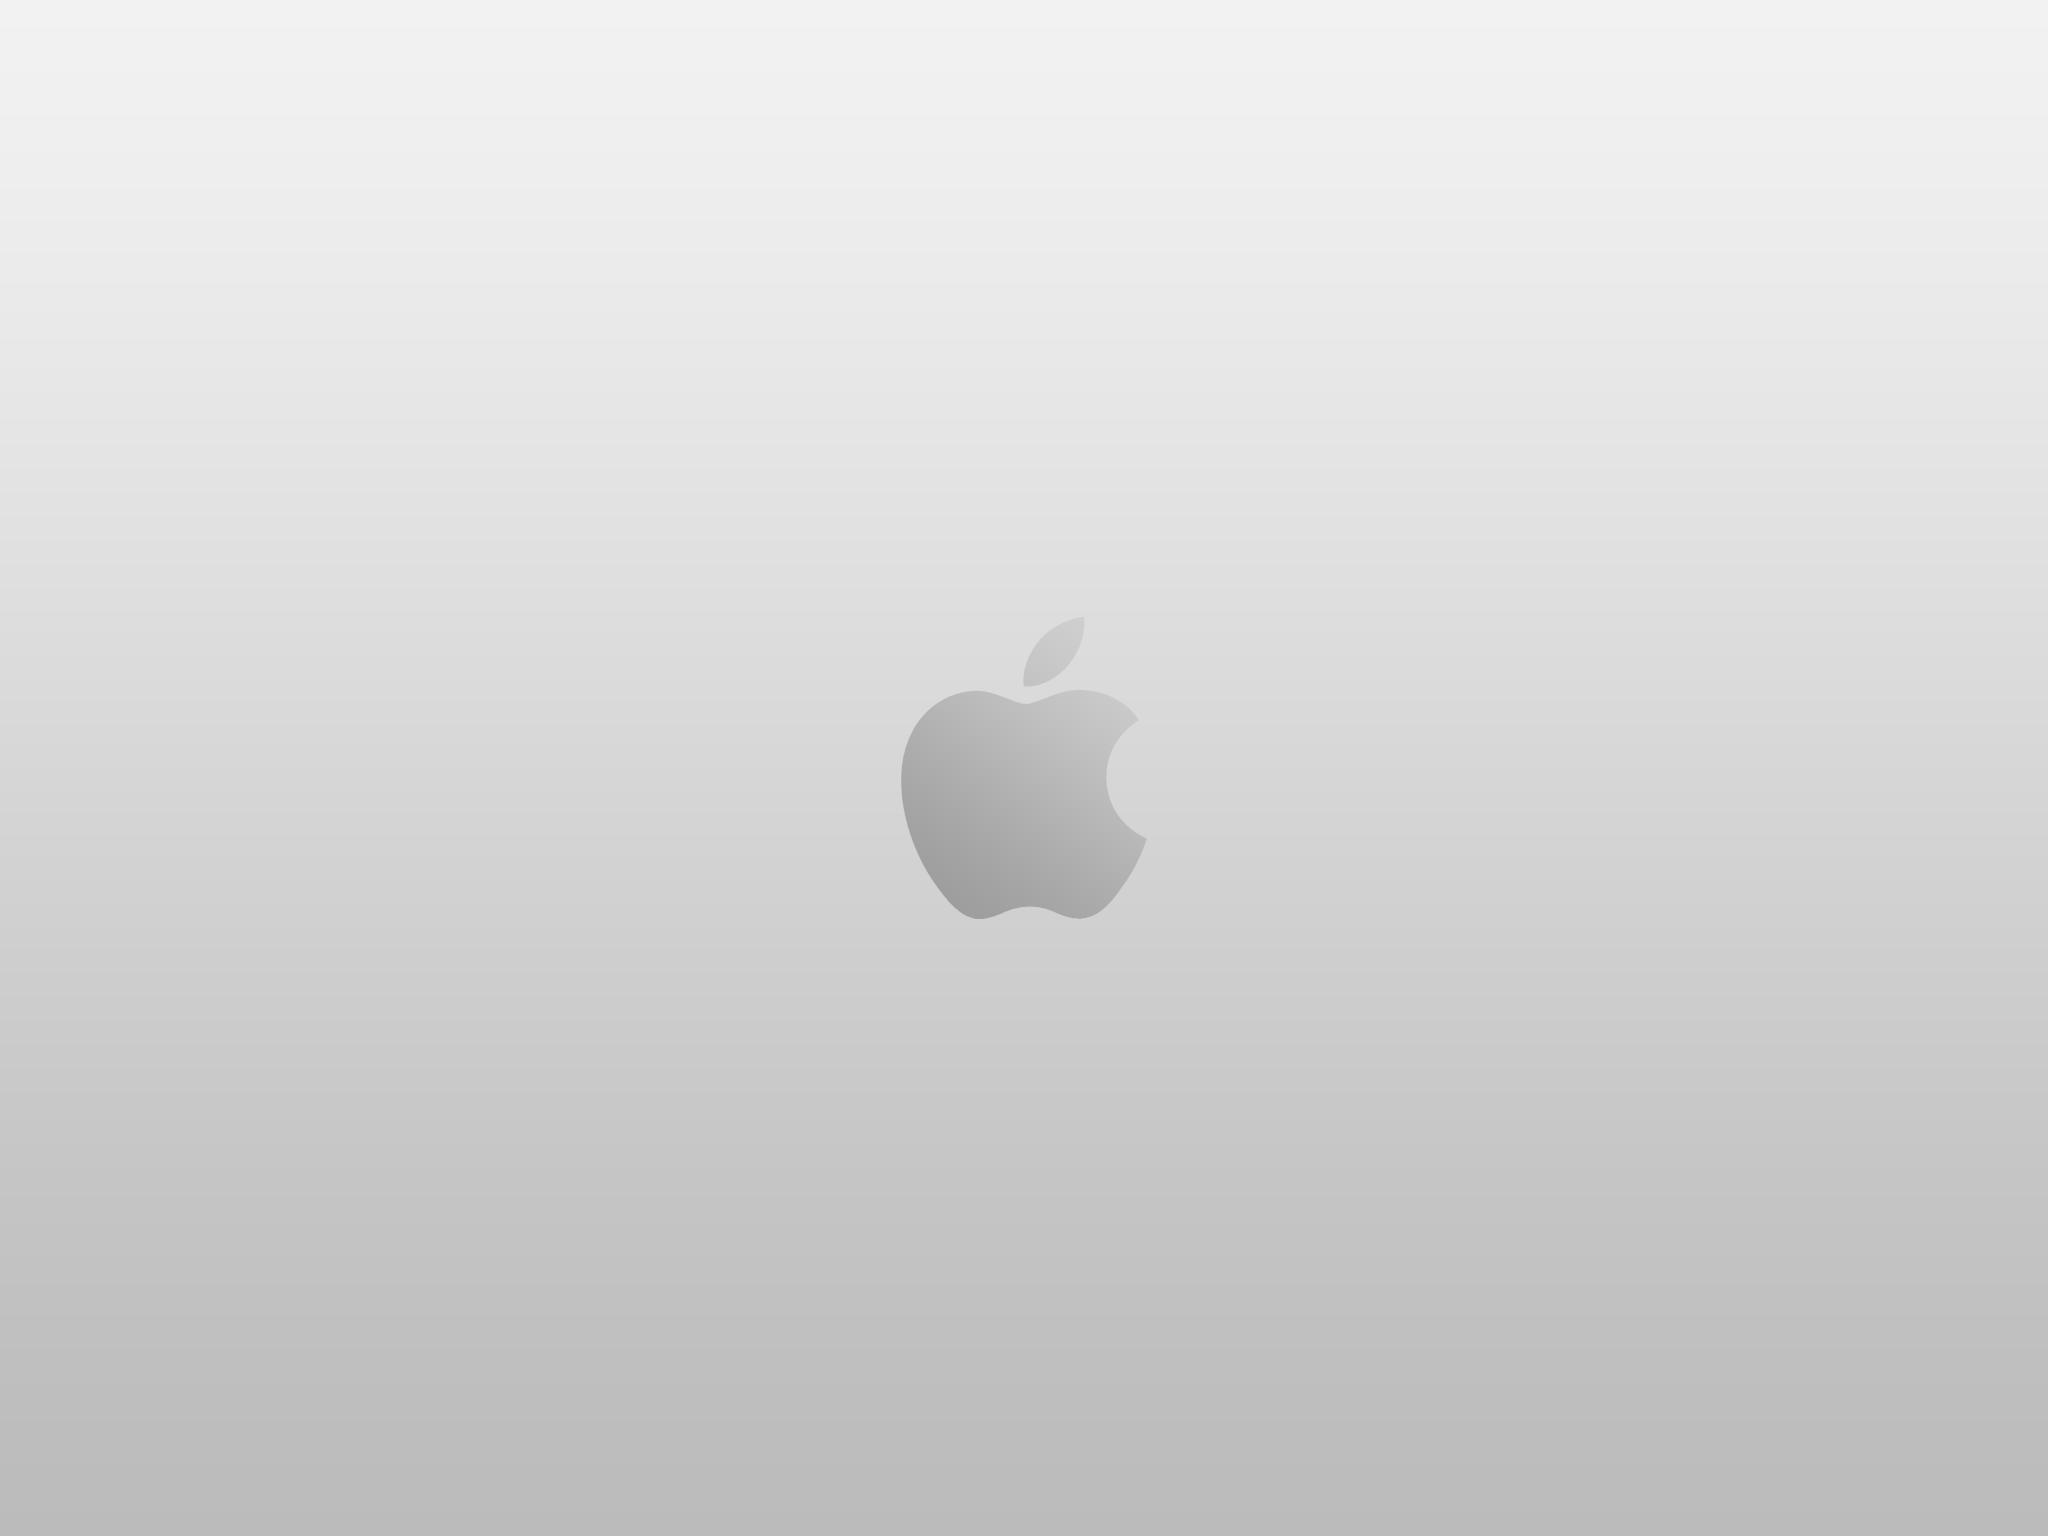 Apple Logo Silver Wallpaper